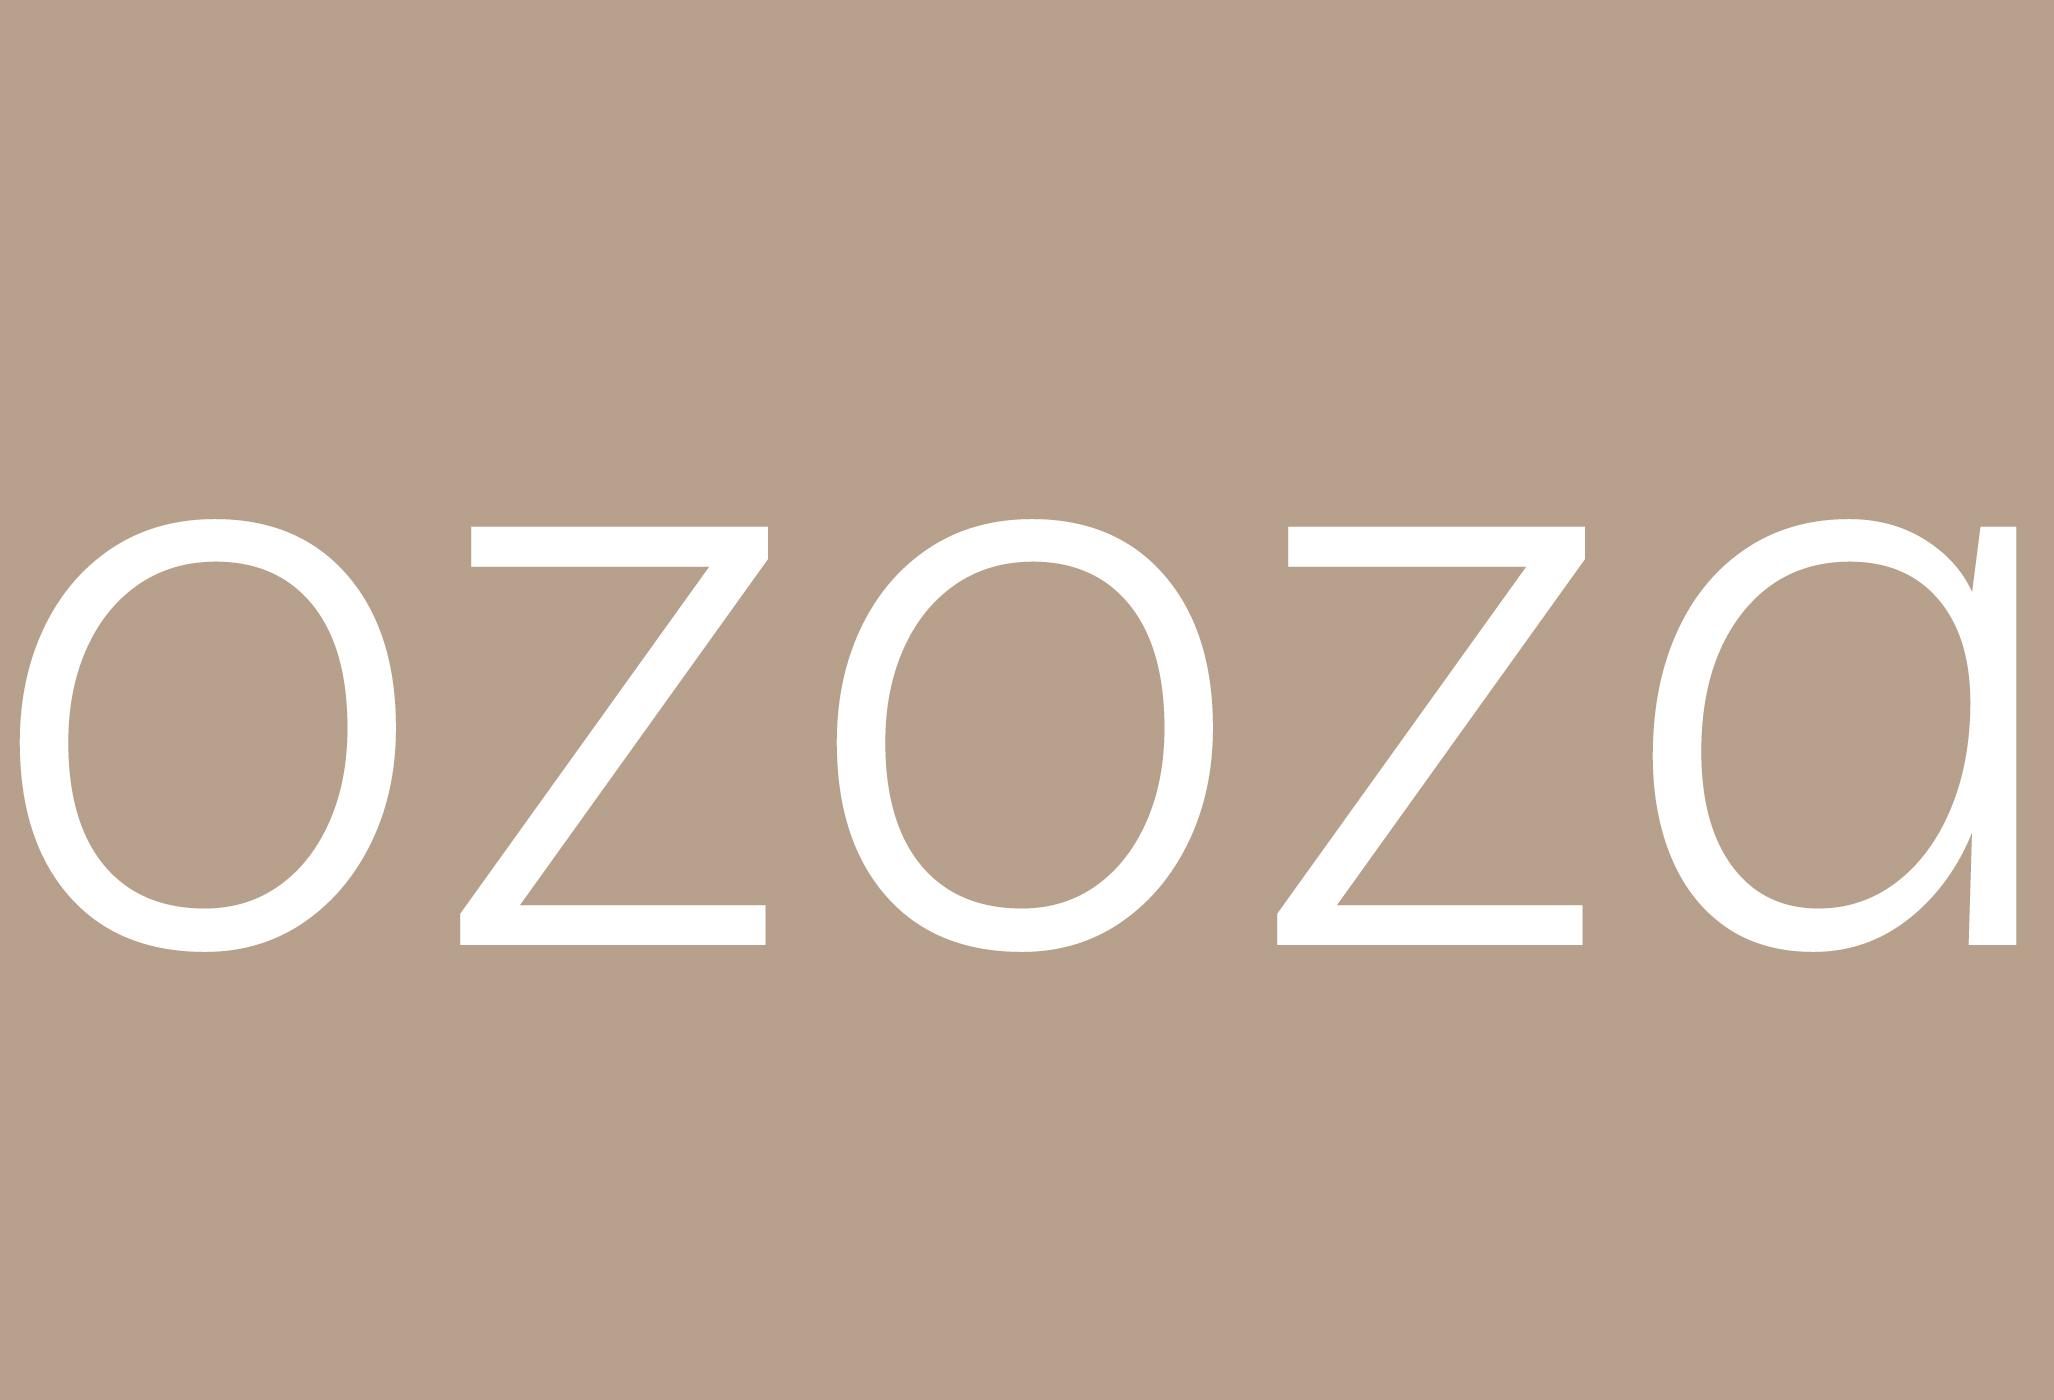 Ozoza